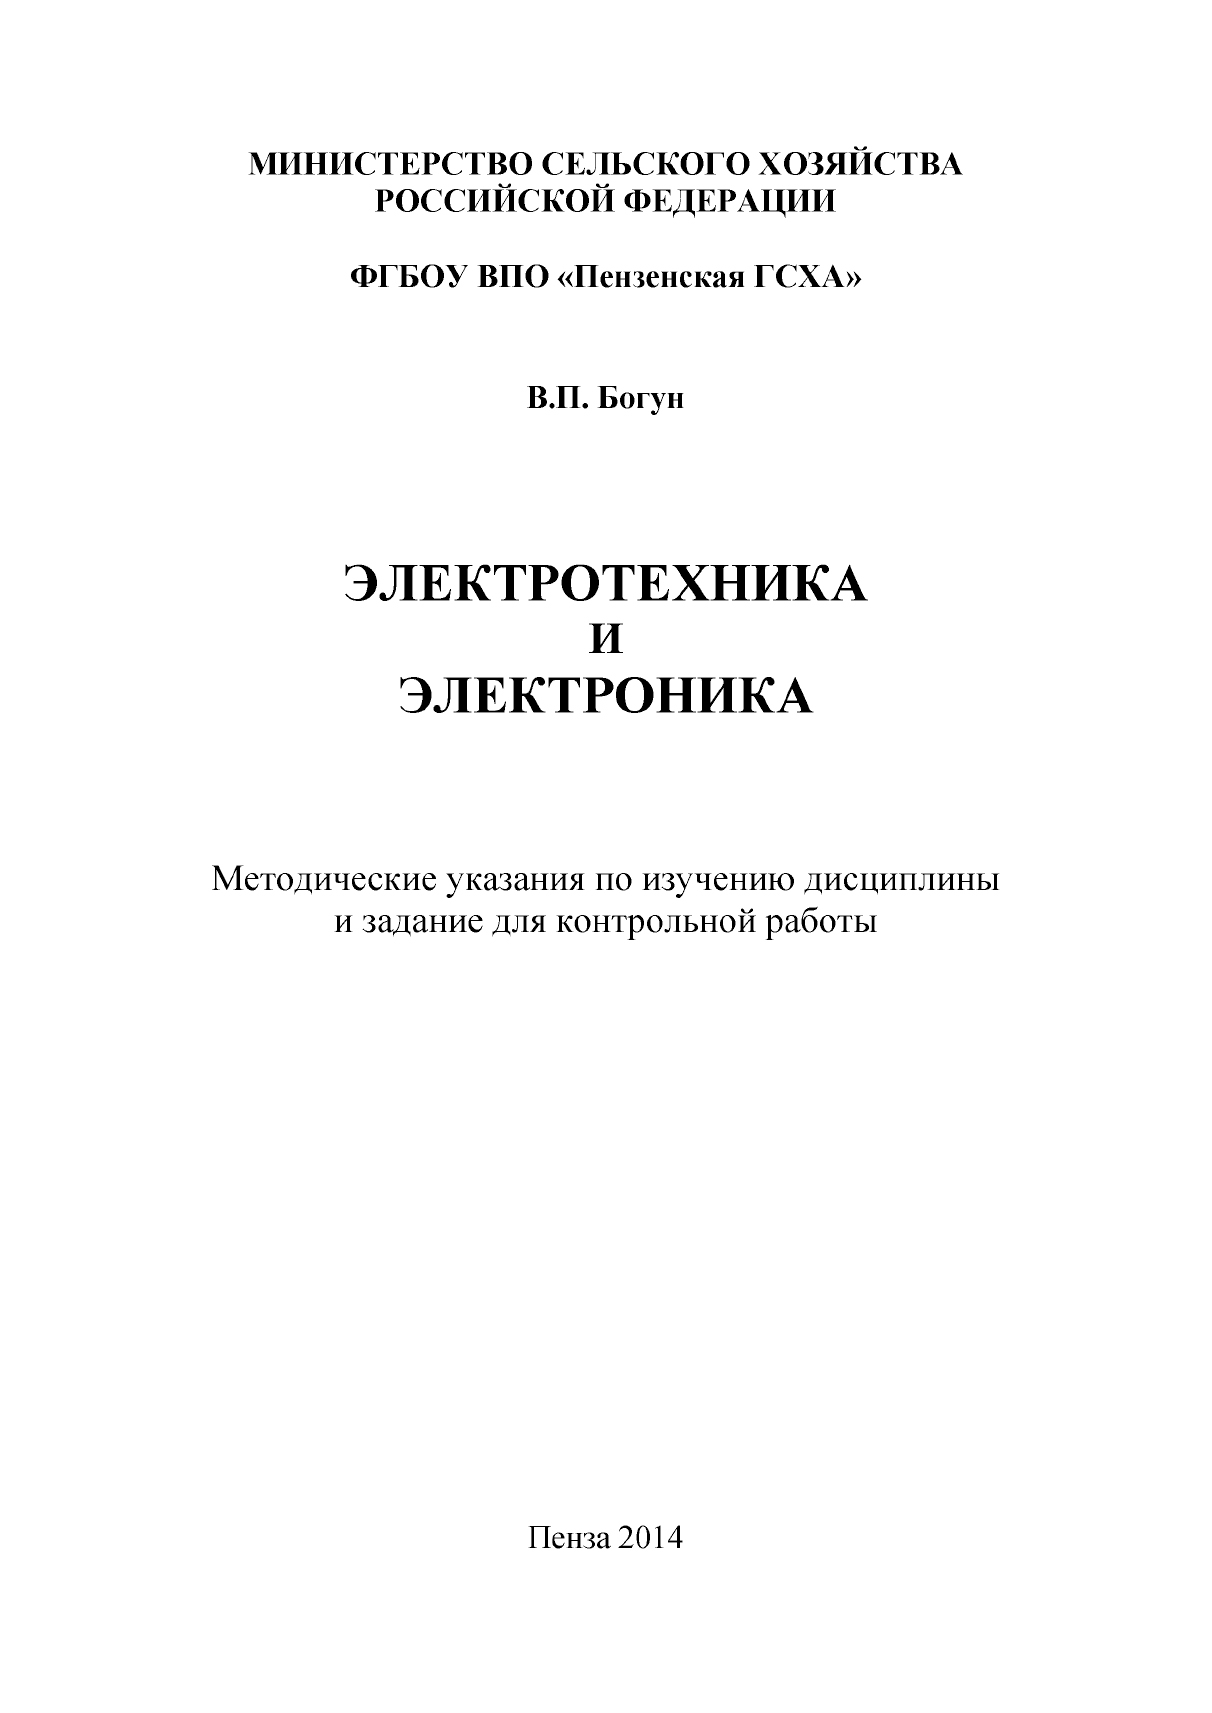 Владимир Богун Электротехника и электроника научная литература как источник специальных знаний